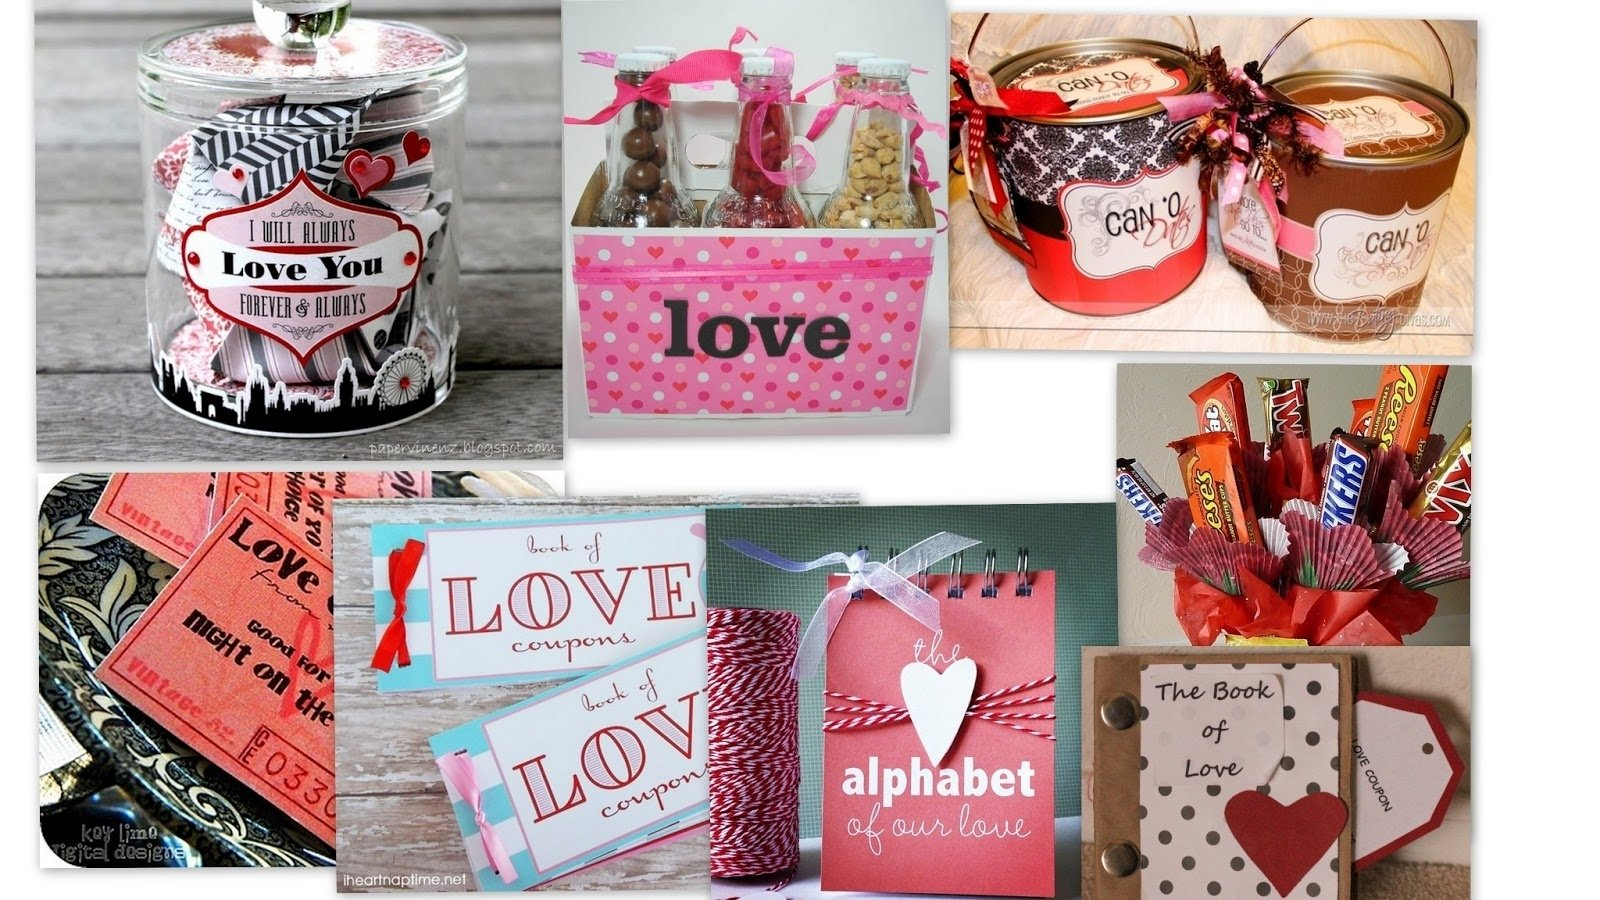 10 Stunning Homemade Valentines Day Ideas Him homemade valentines day gift ideas startupcorner co 2 2020